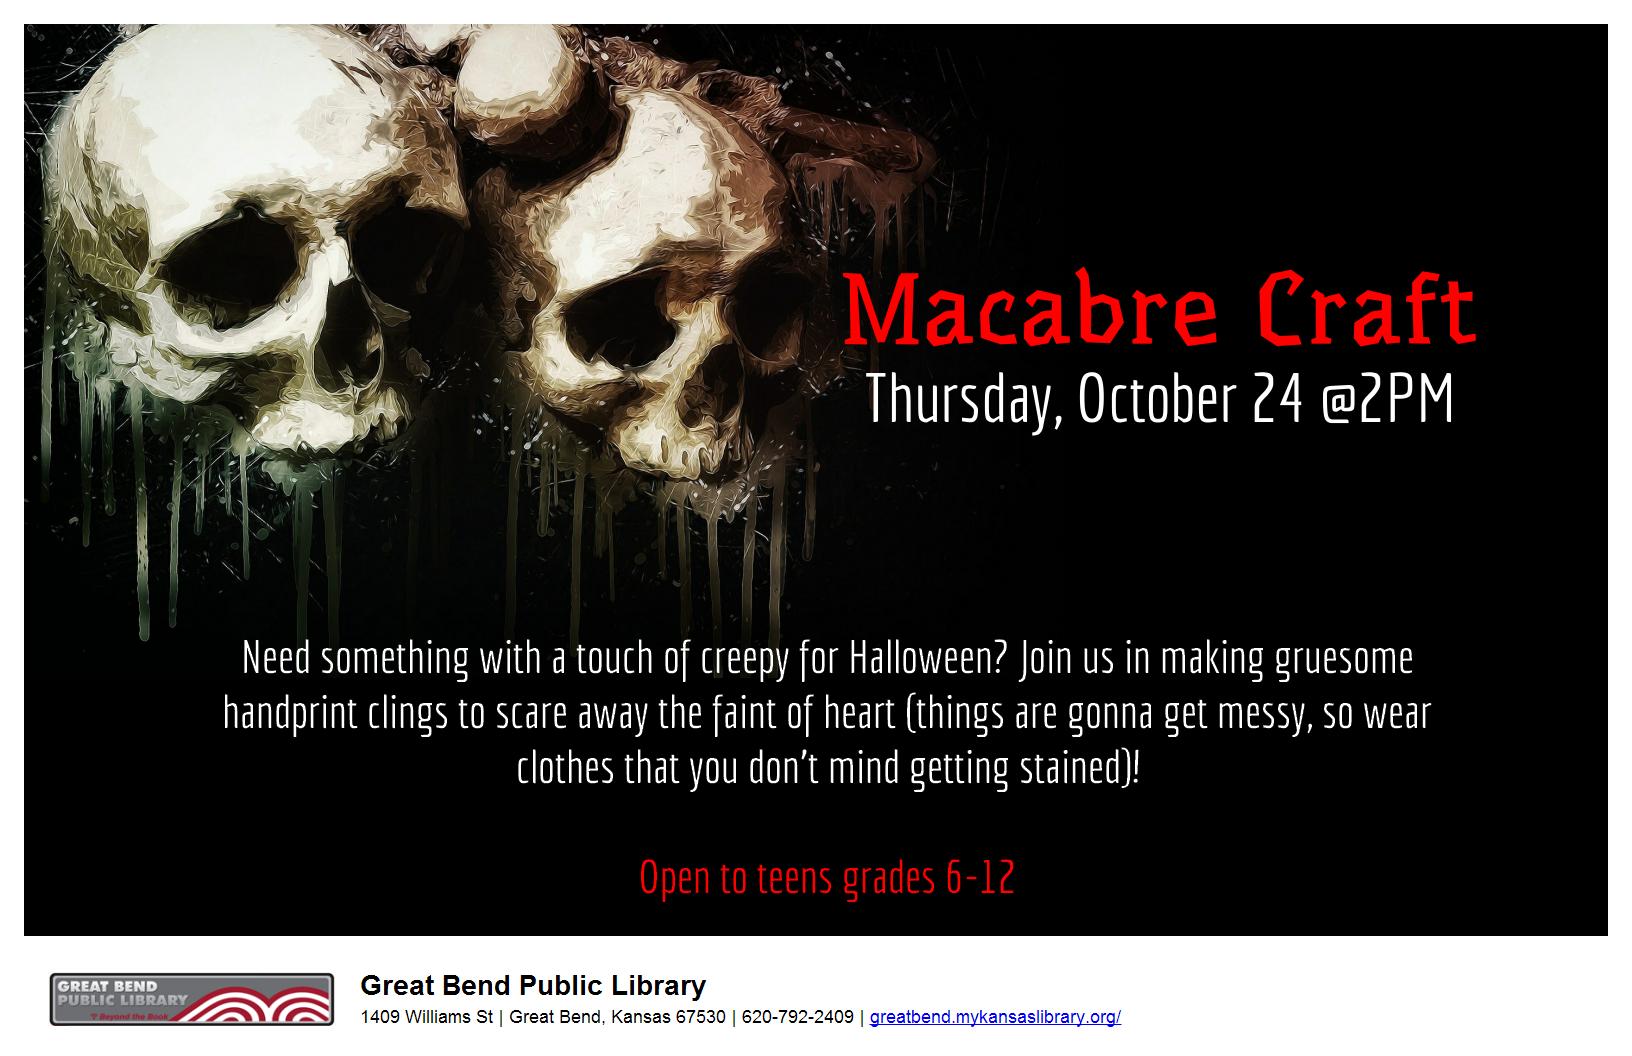 Macabre Craft